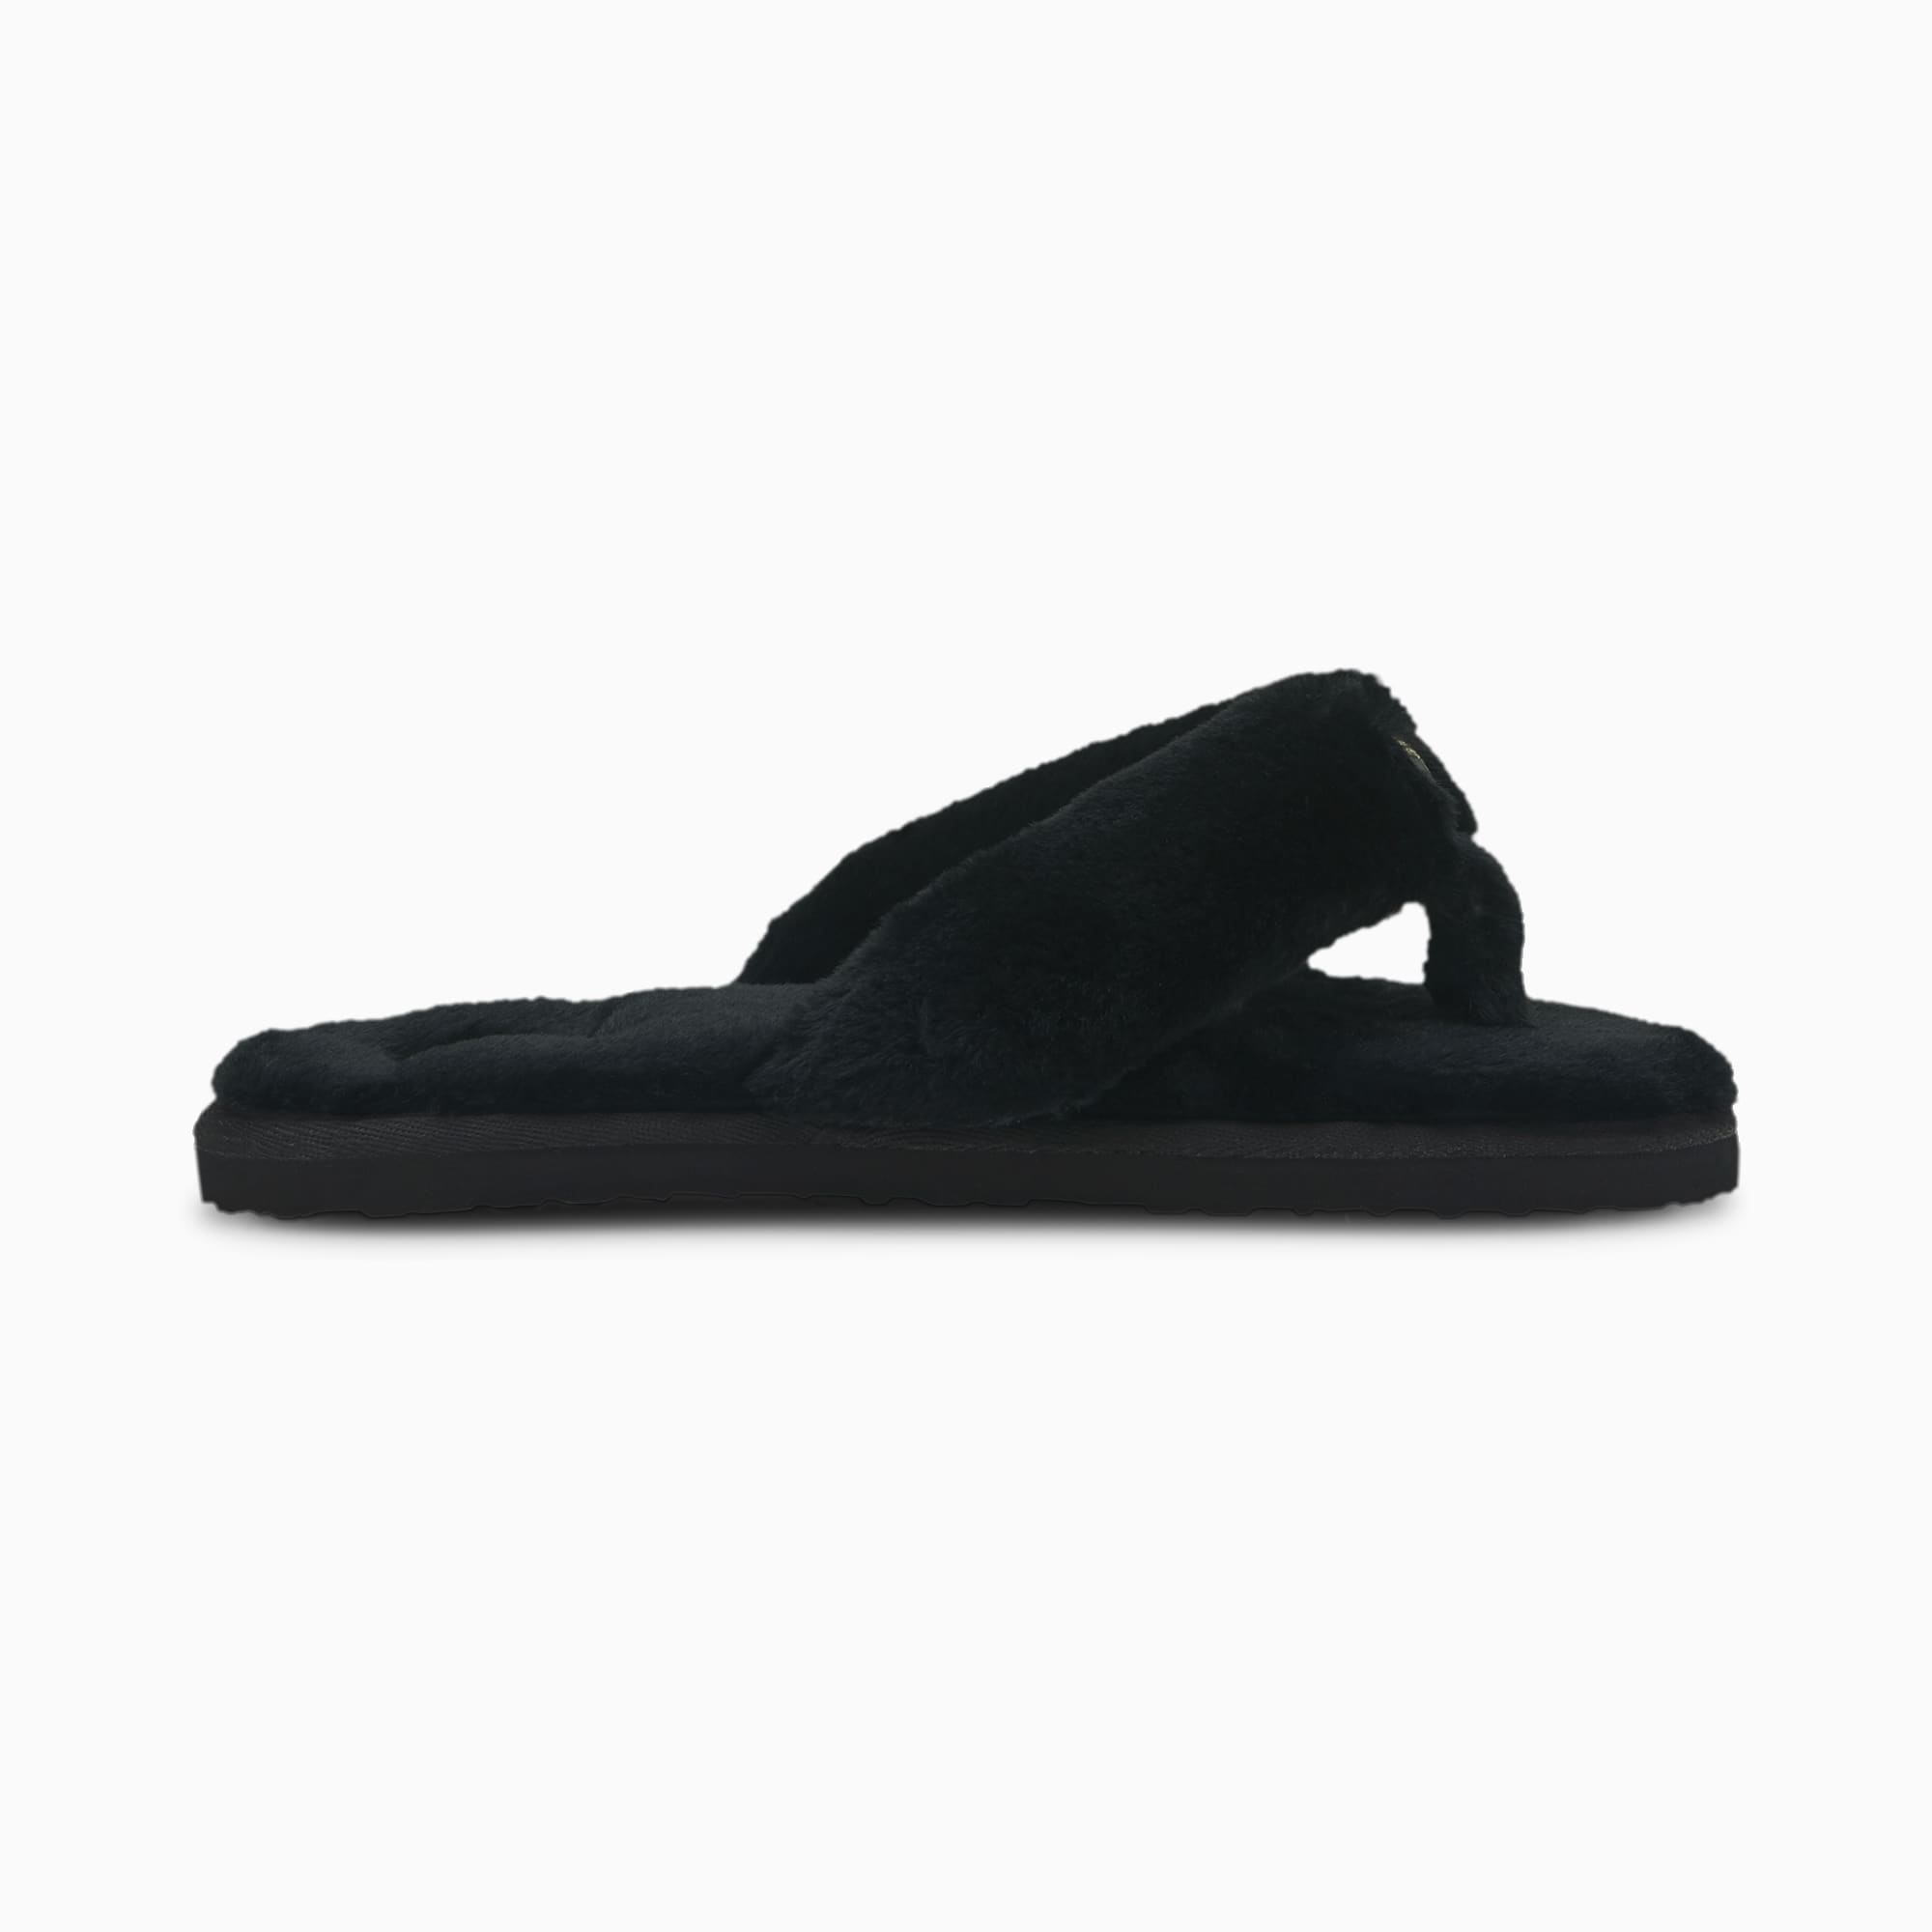 PUMA Fluff Flip Women's Shoes